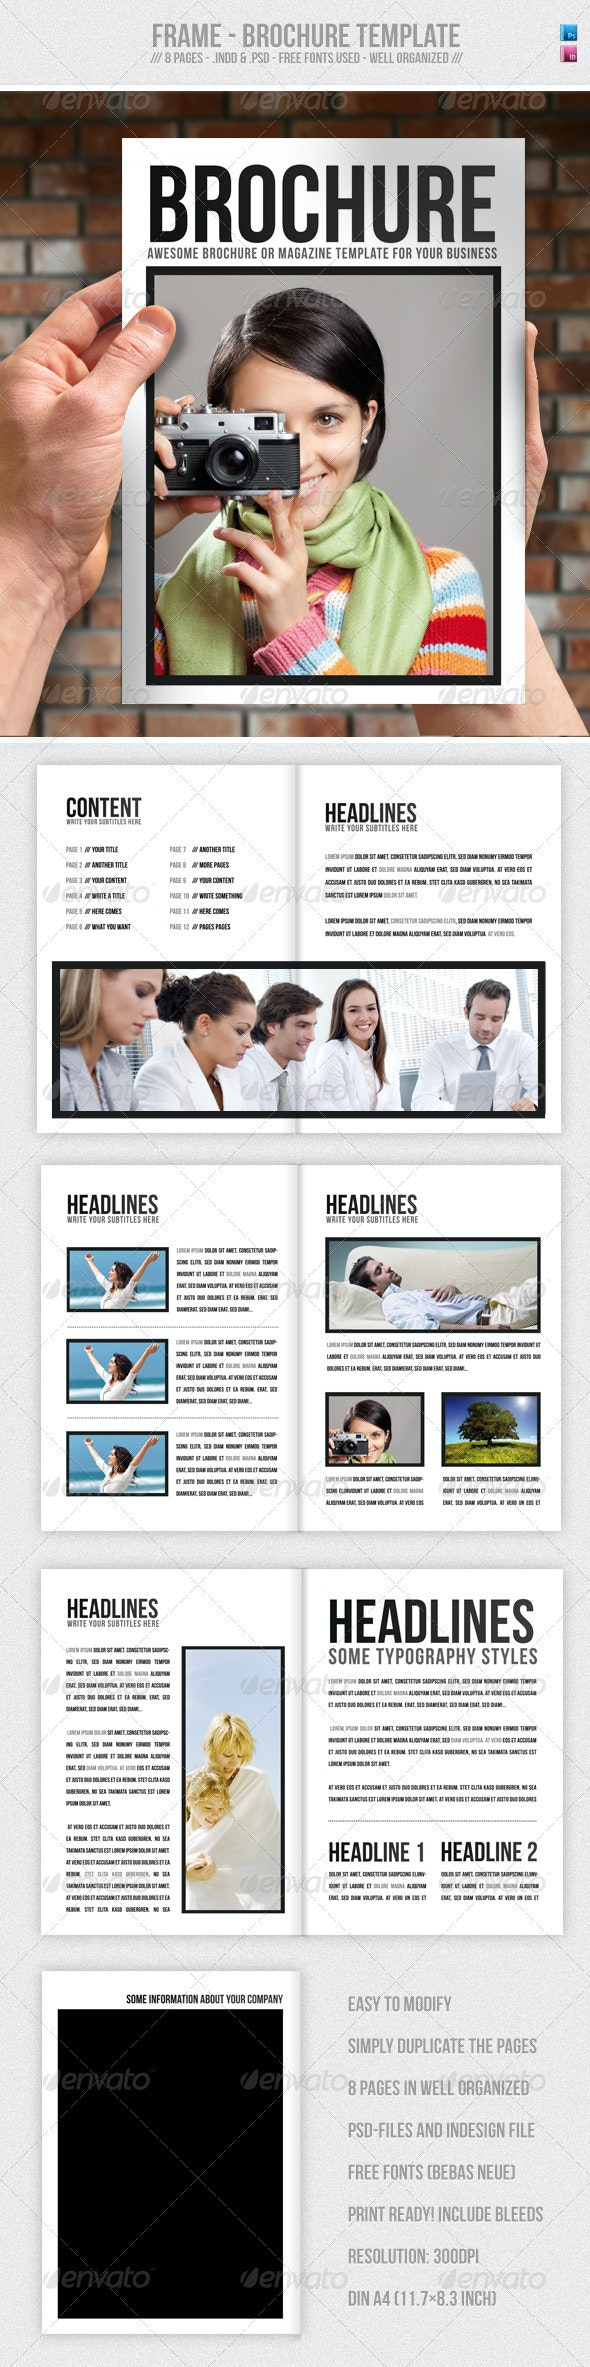 Frame - Brochure / Presentation Template  - Corporate Brochures